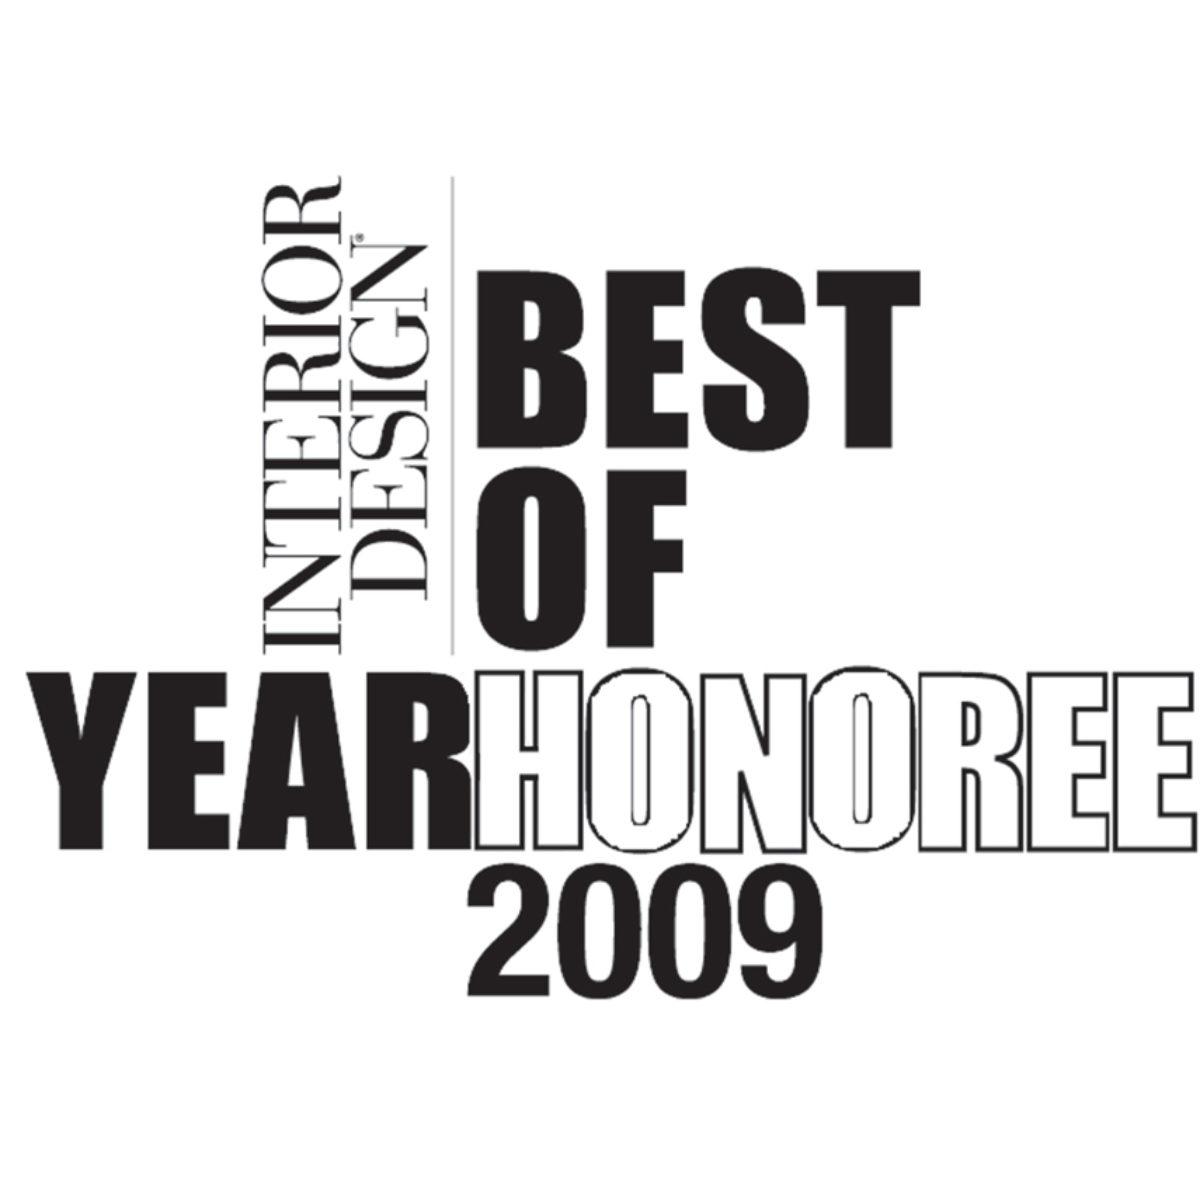 Interior Design Best of Year Honoree 2009 logo